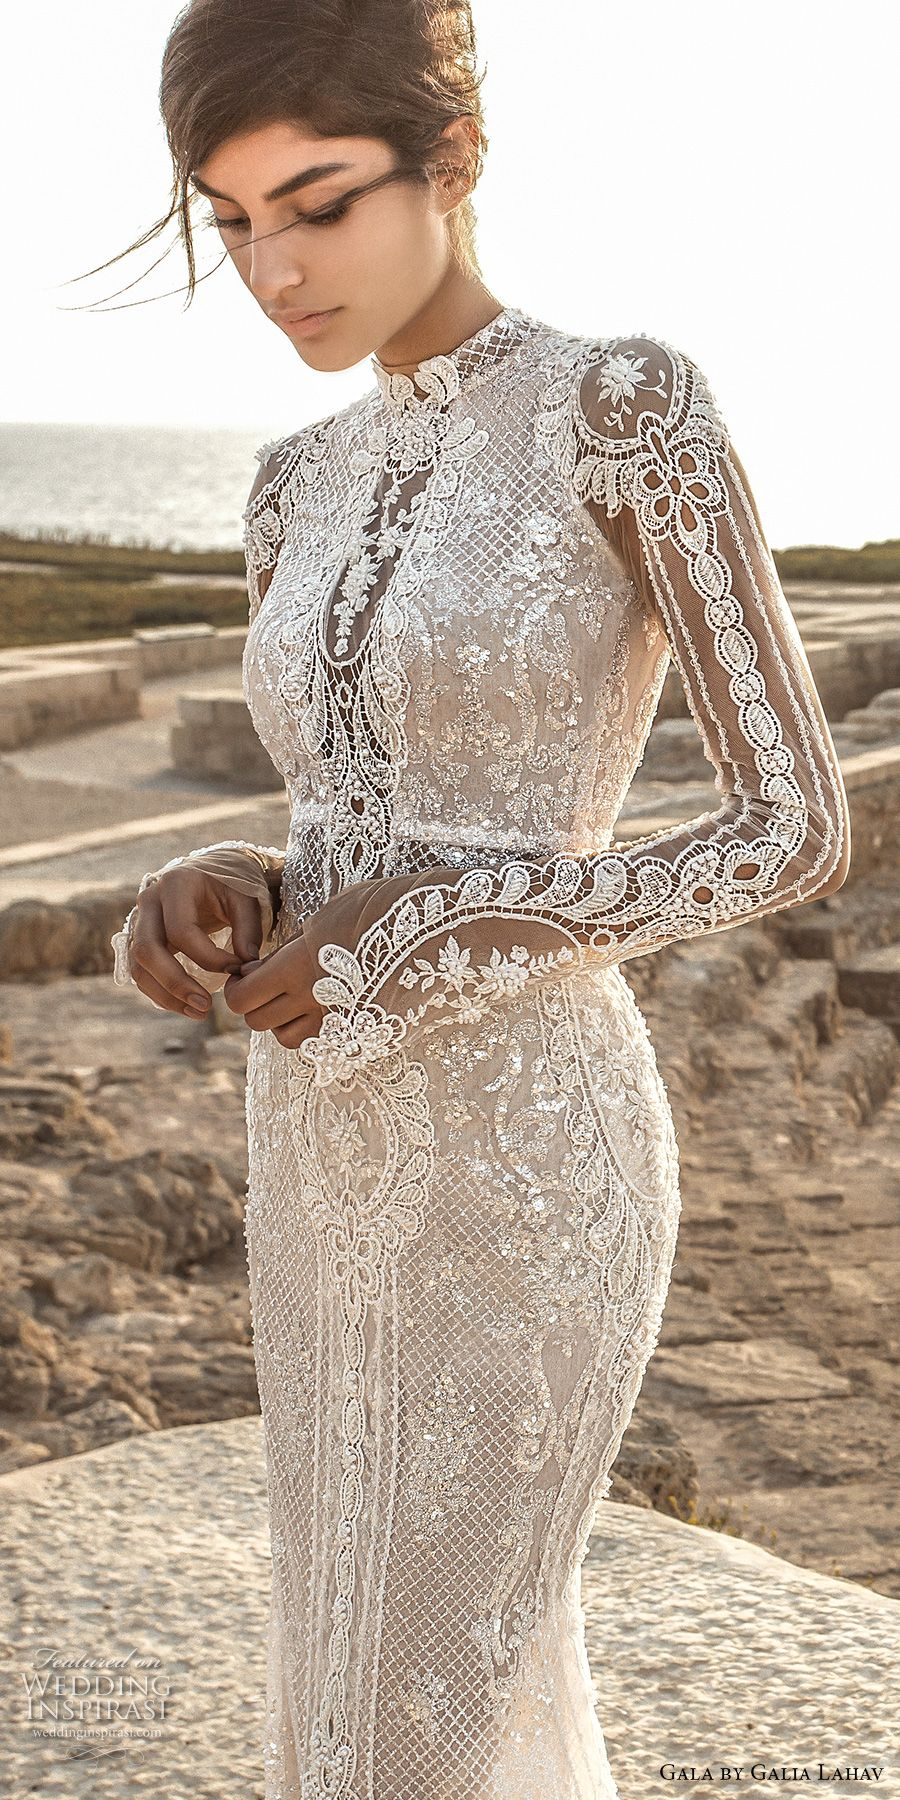 Beaded sheath wedding dress  Gala by Galia Lahav  Wedding Dresses u Bridal Collection no III